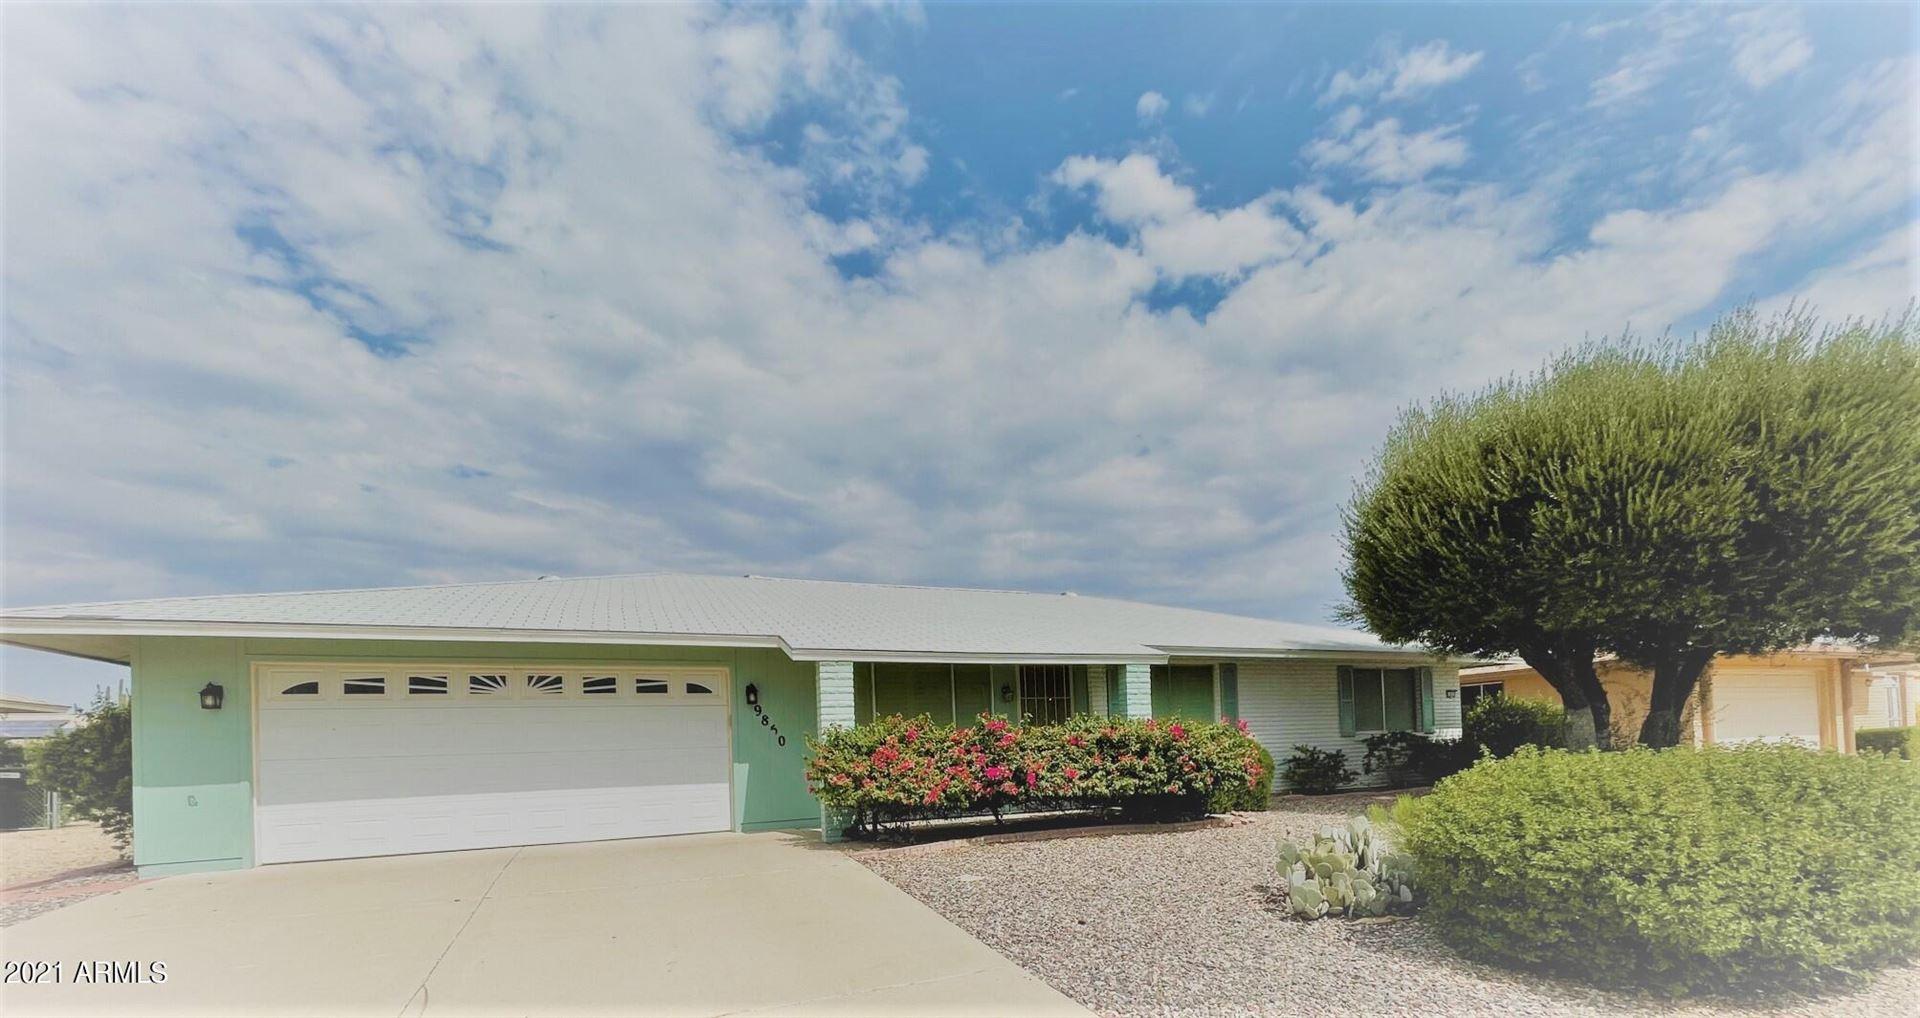 Photo of 9850 W Santa Fe Drive, Sun City, AZ 85351 (MLS # 6295270)